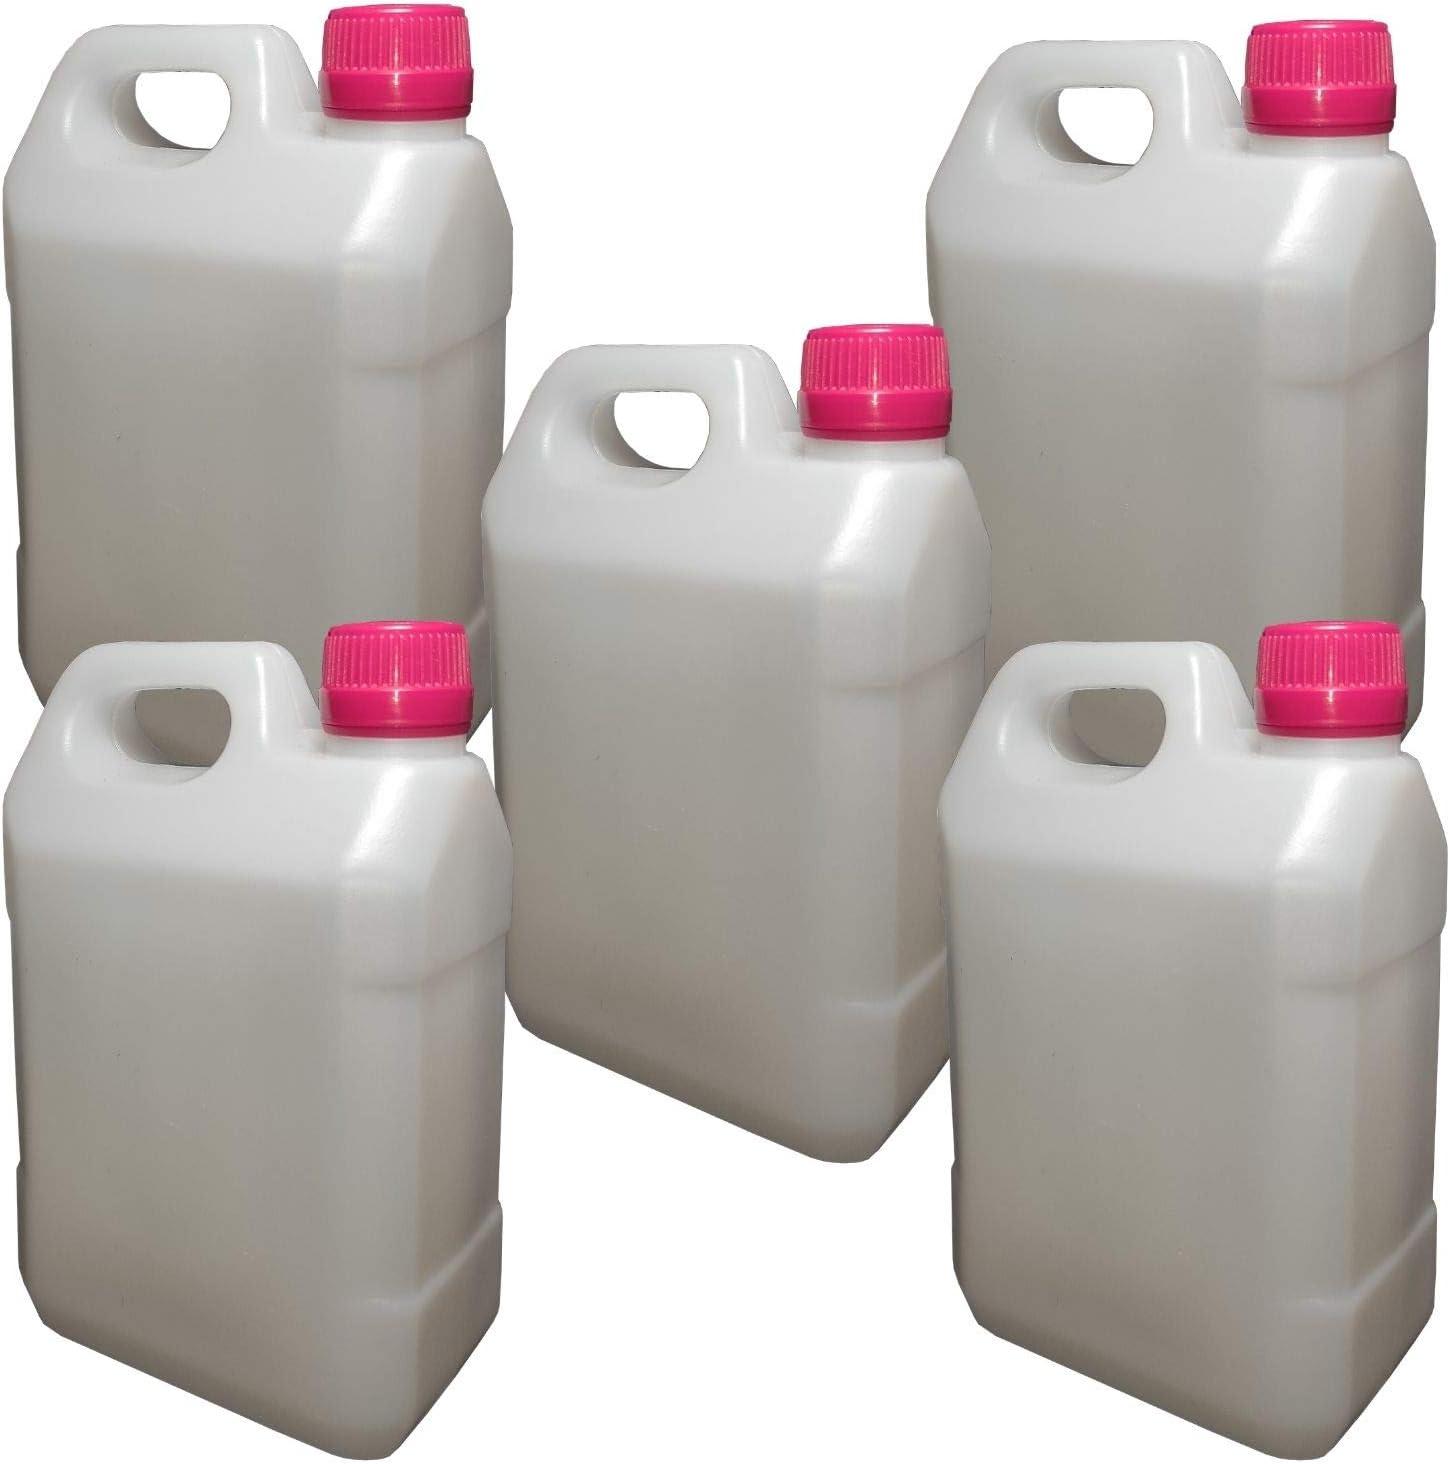 5 Bidones de 1000 ml de Polietileno de Alta Densidad (HDPE) con tapón - Garrafa de 1 litro para Camping aceites Gasolina o Productos químicos, Botella de plastico bidon Jerry Alcohol